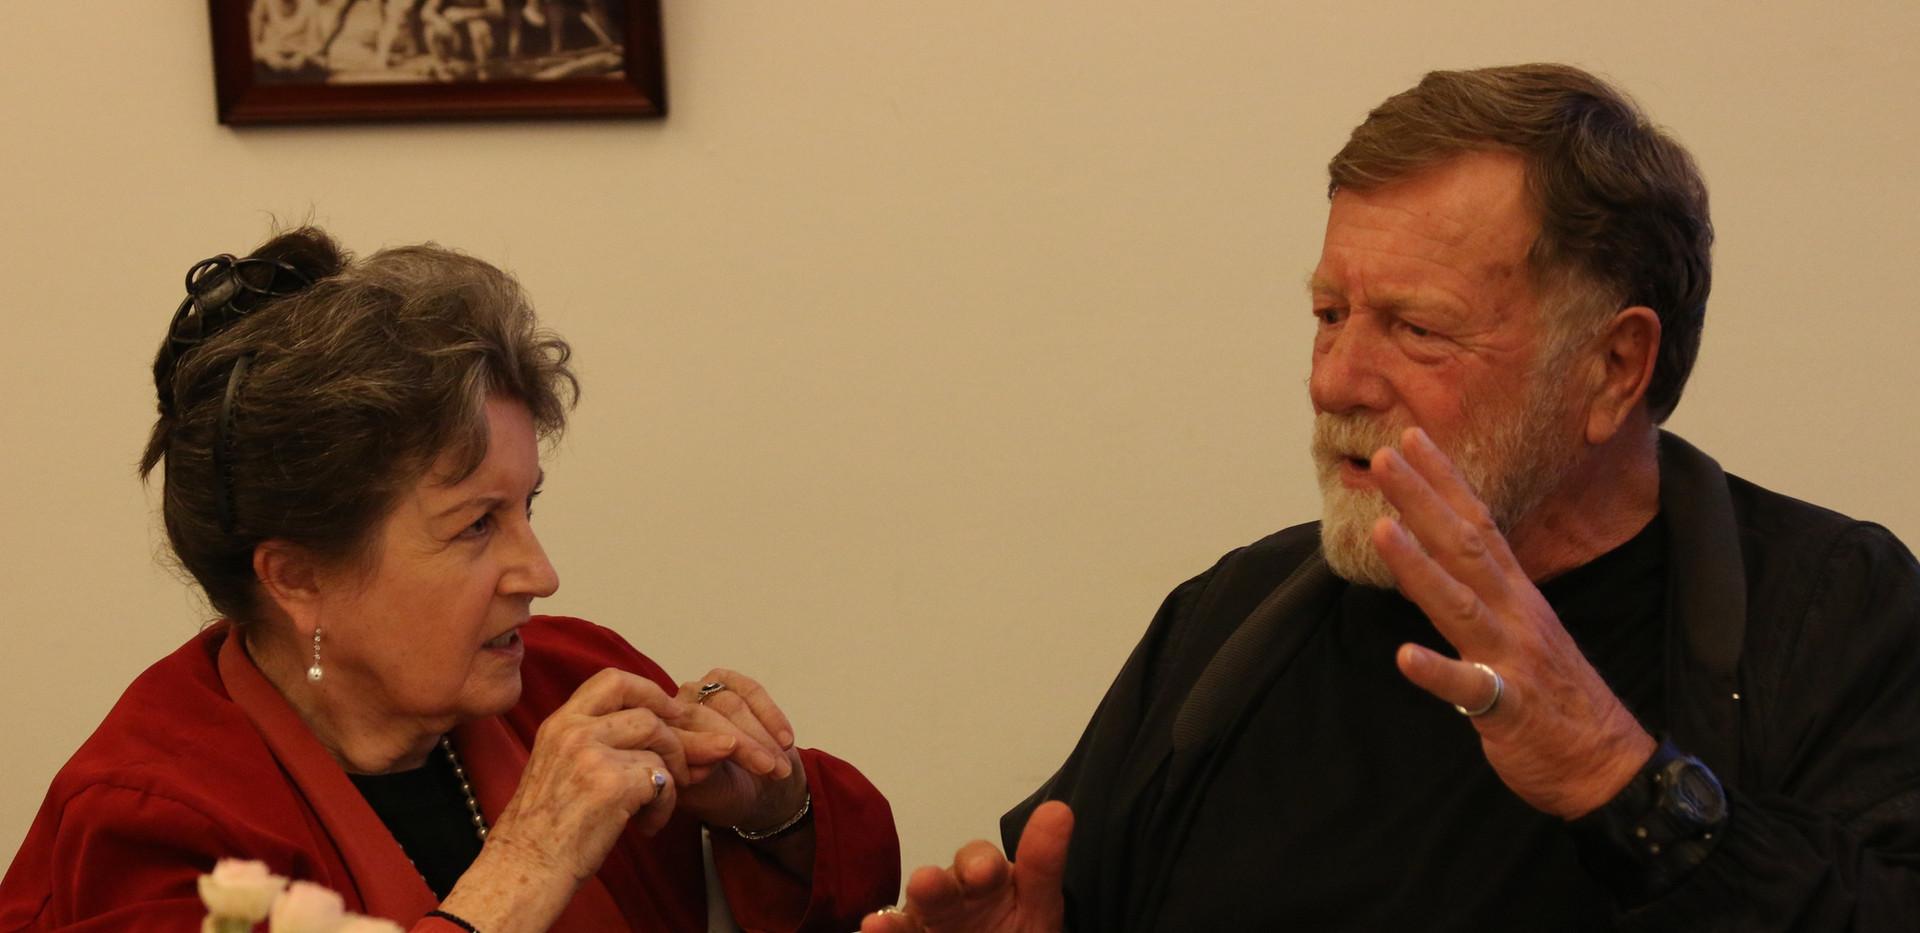 Lorraine Bayly and Jack Thompson